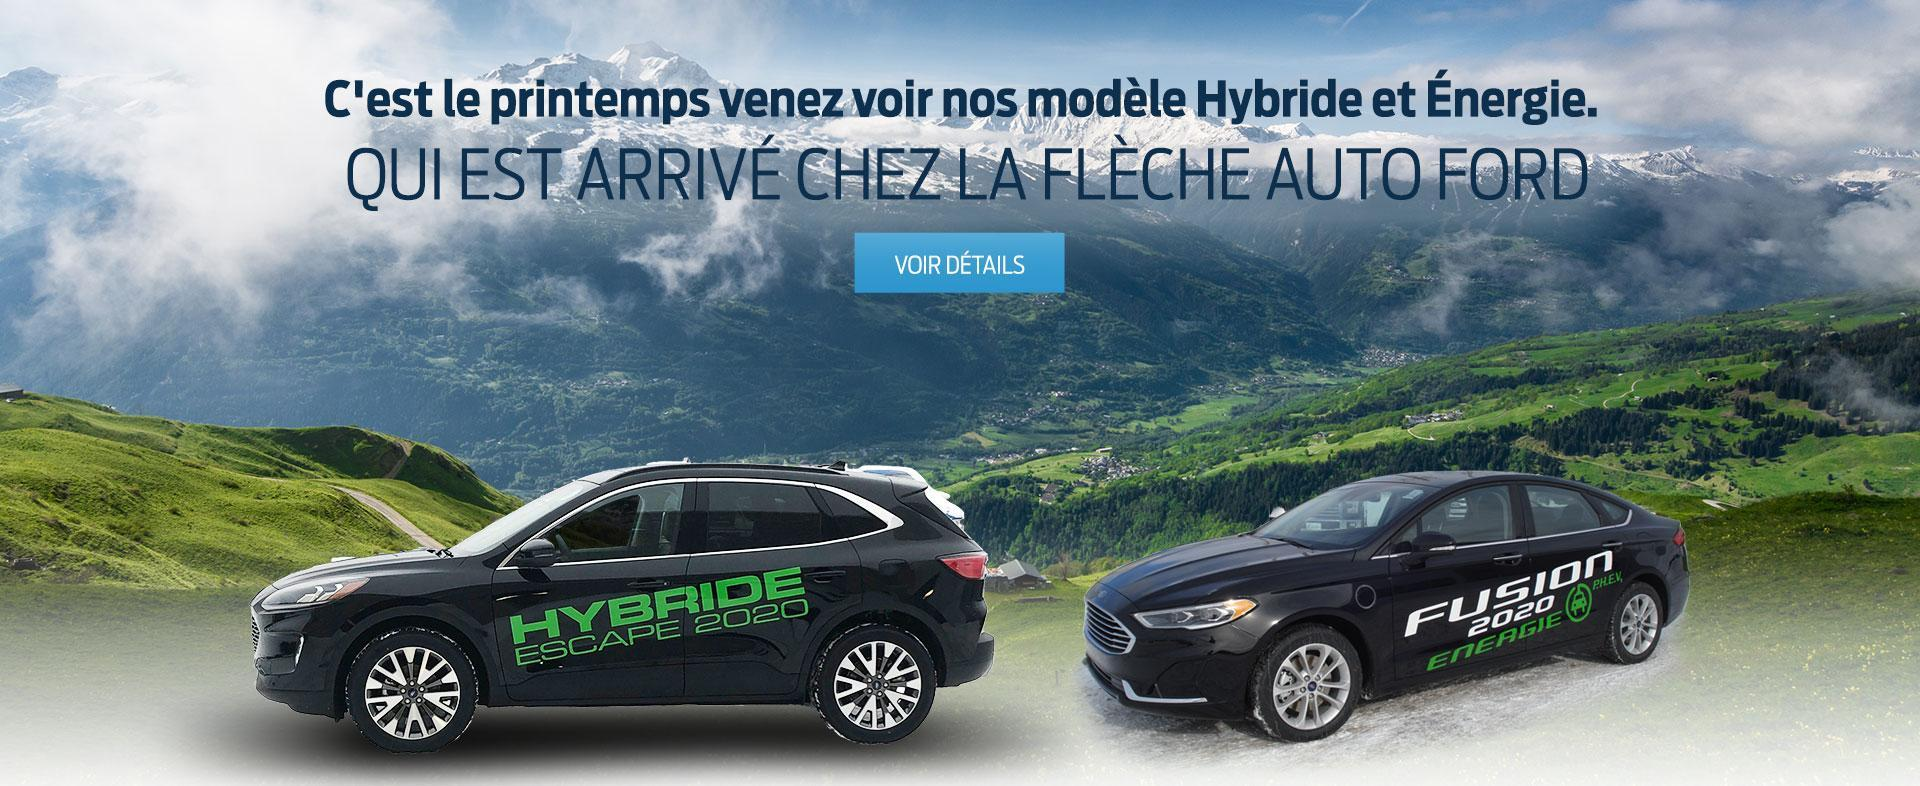 2020 Ford Hybrids